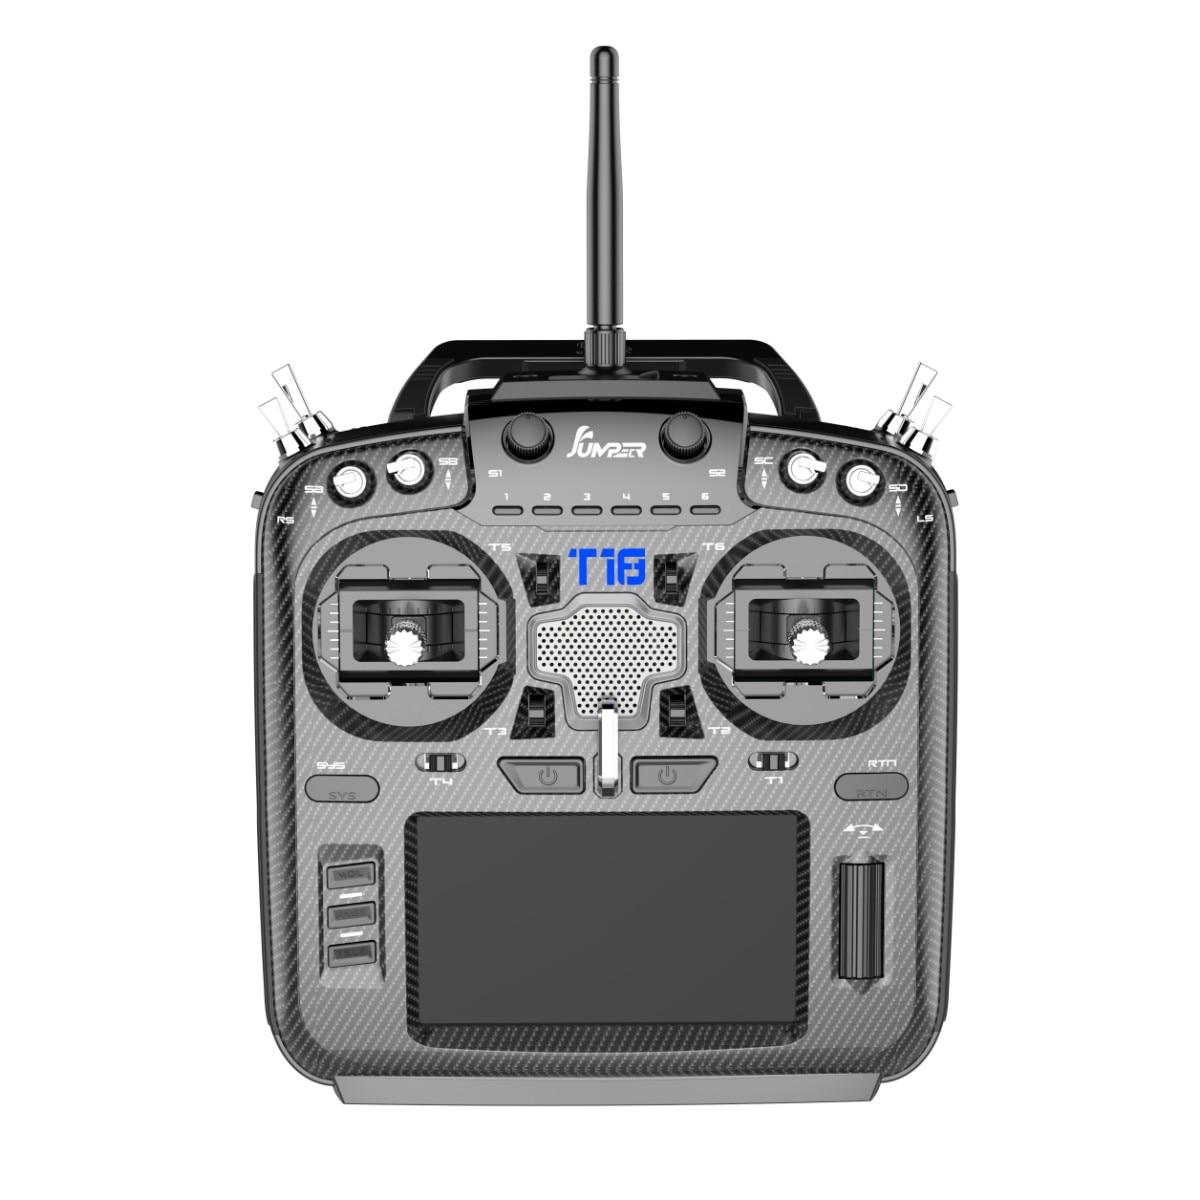 Presale Jumper T18 T18 Pro RDC90 Sensor Radio Open Source Multi-protocol Radio Transmitter JP5-in-1 RF Module 2.4G 915mhz VS T16